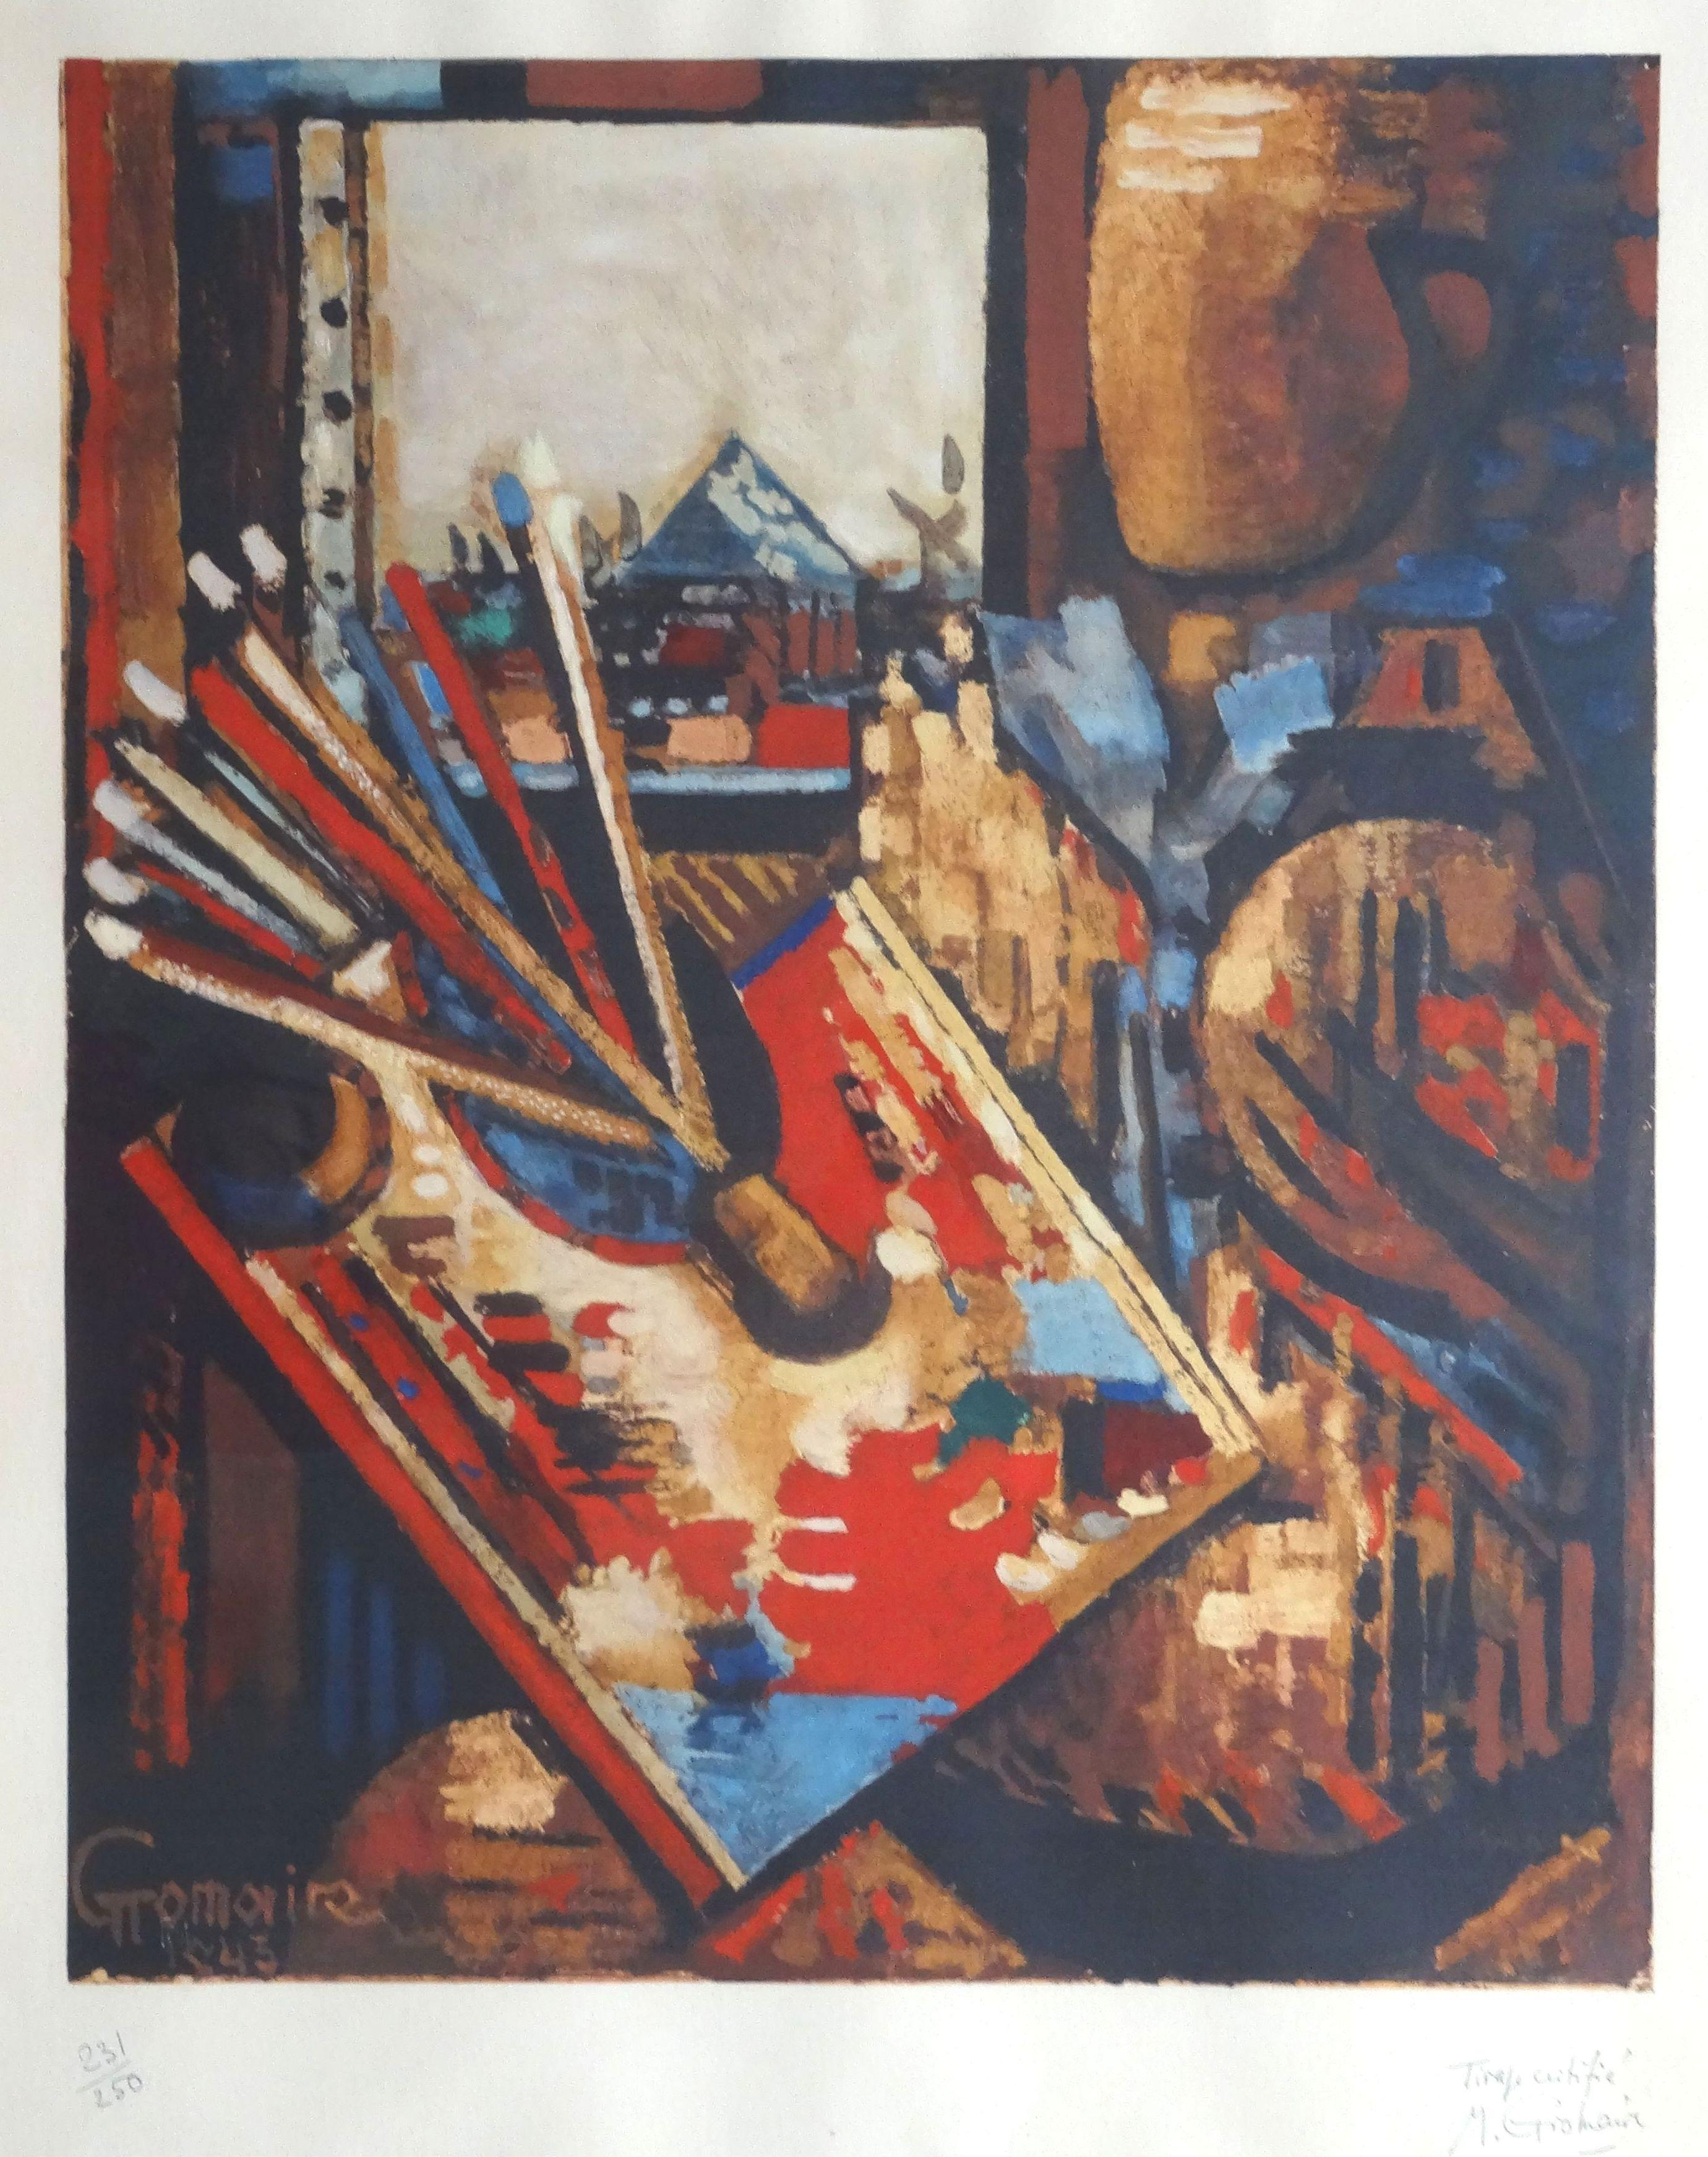 The painter. 1943, paper, lithograph, 56x46 cm